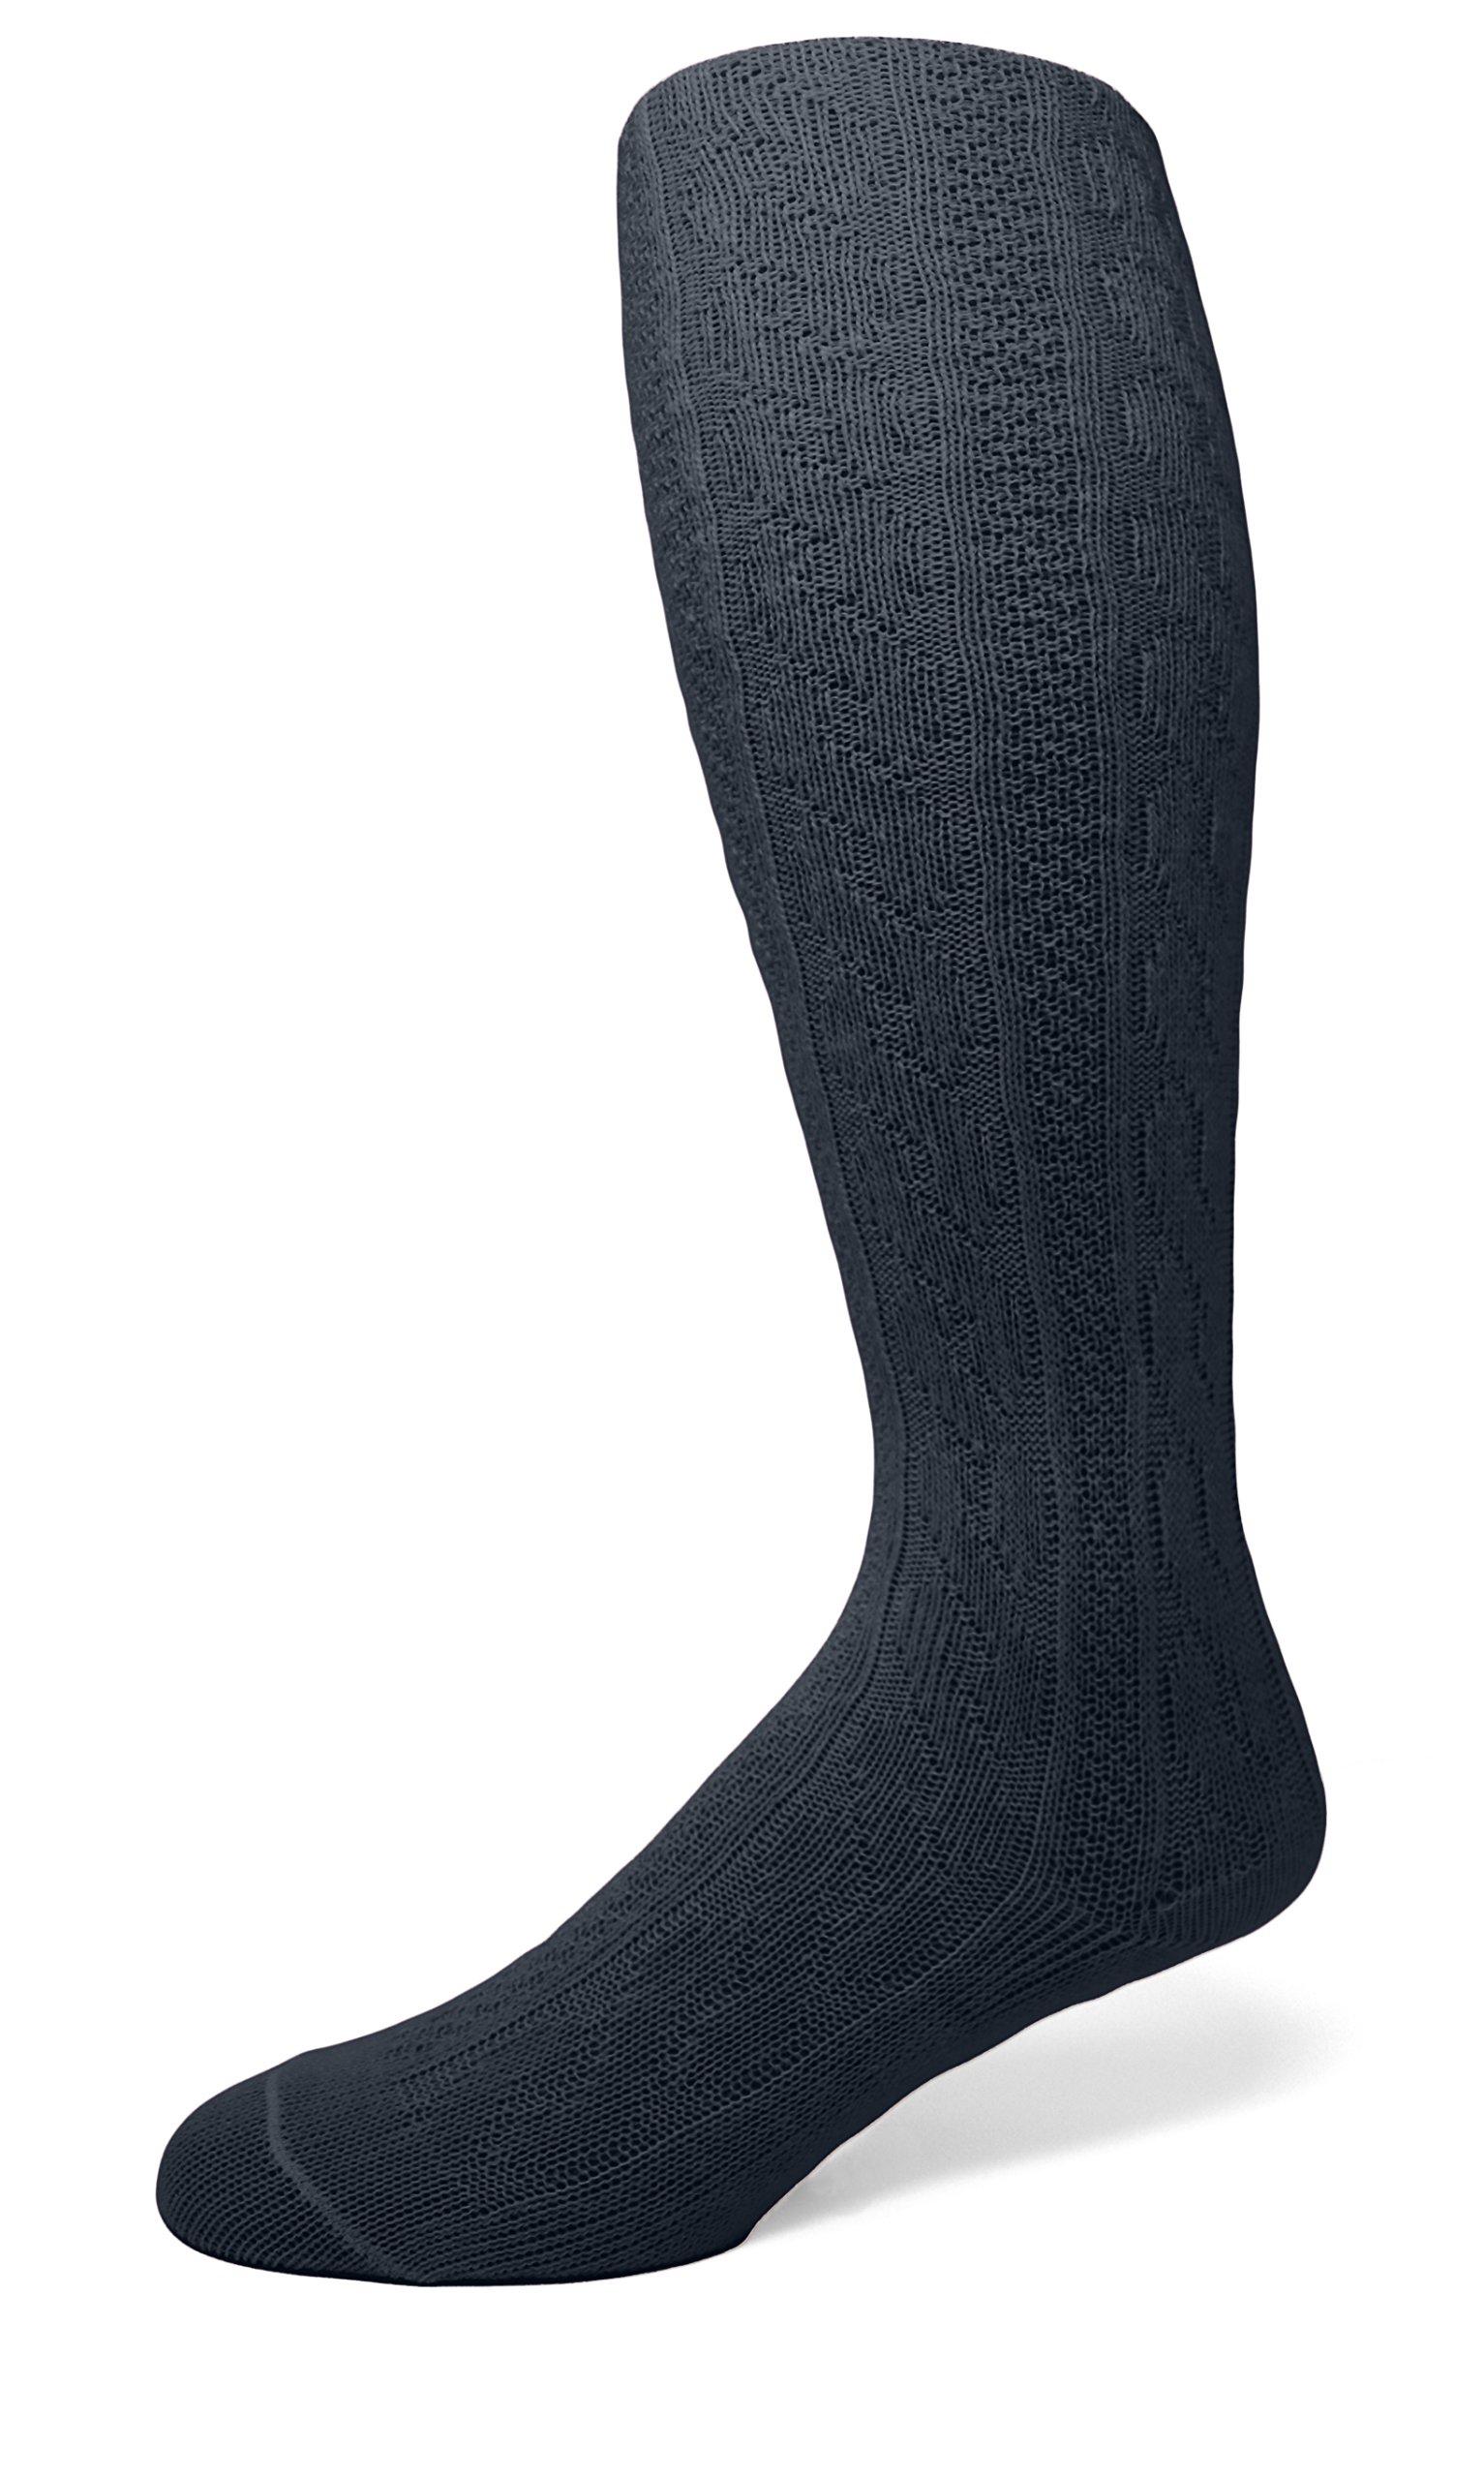 EMEM Apparel Girls' Kids Children's Cable Knit Opaque School Uniform Sweater Winter Tights Hosiery Stockings Navy 12-14